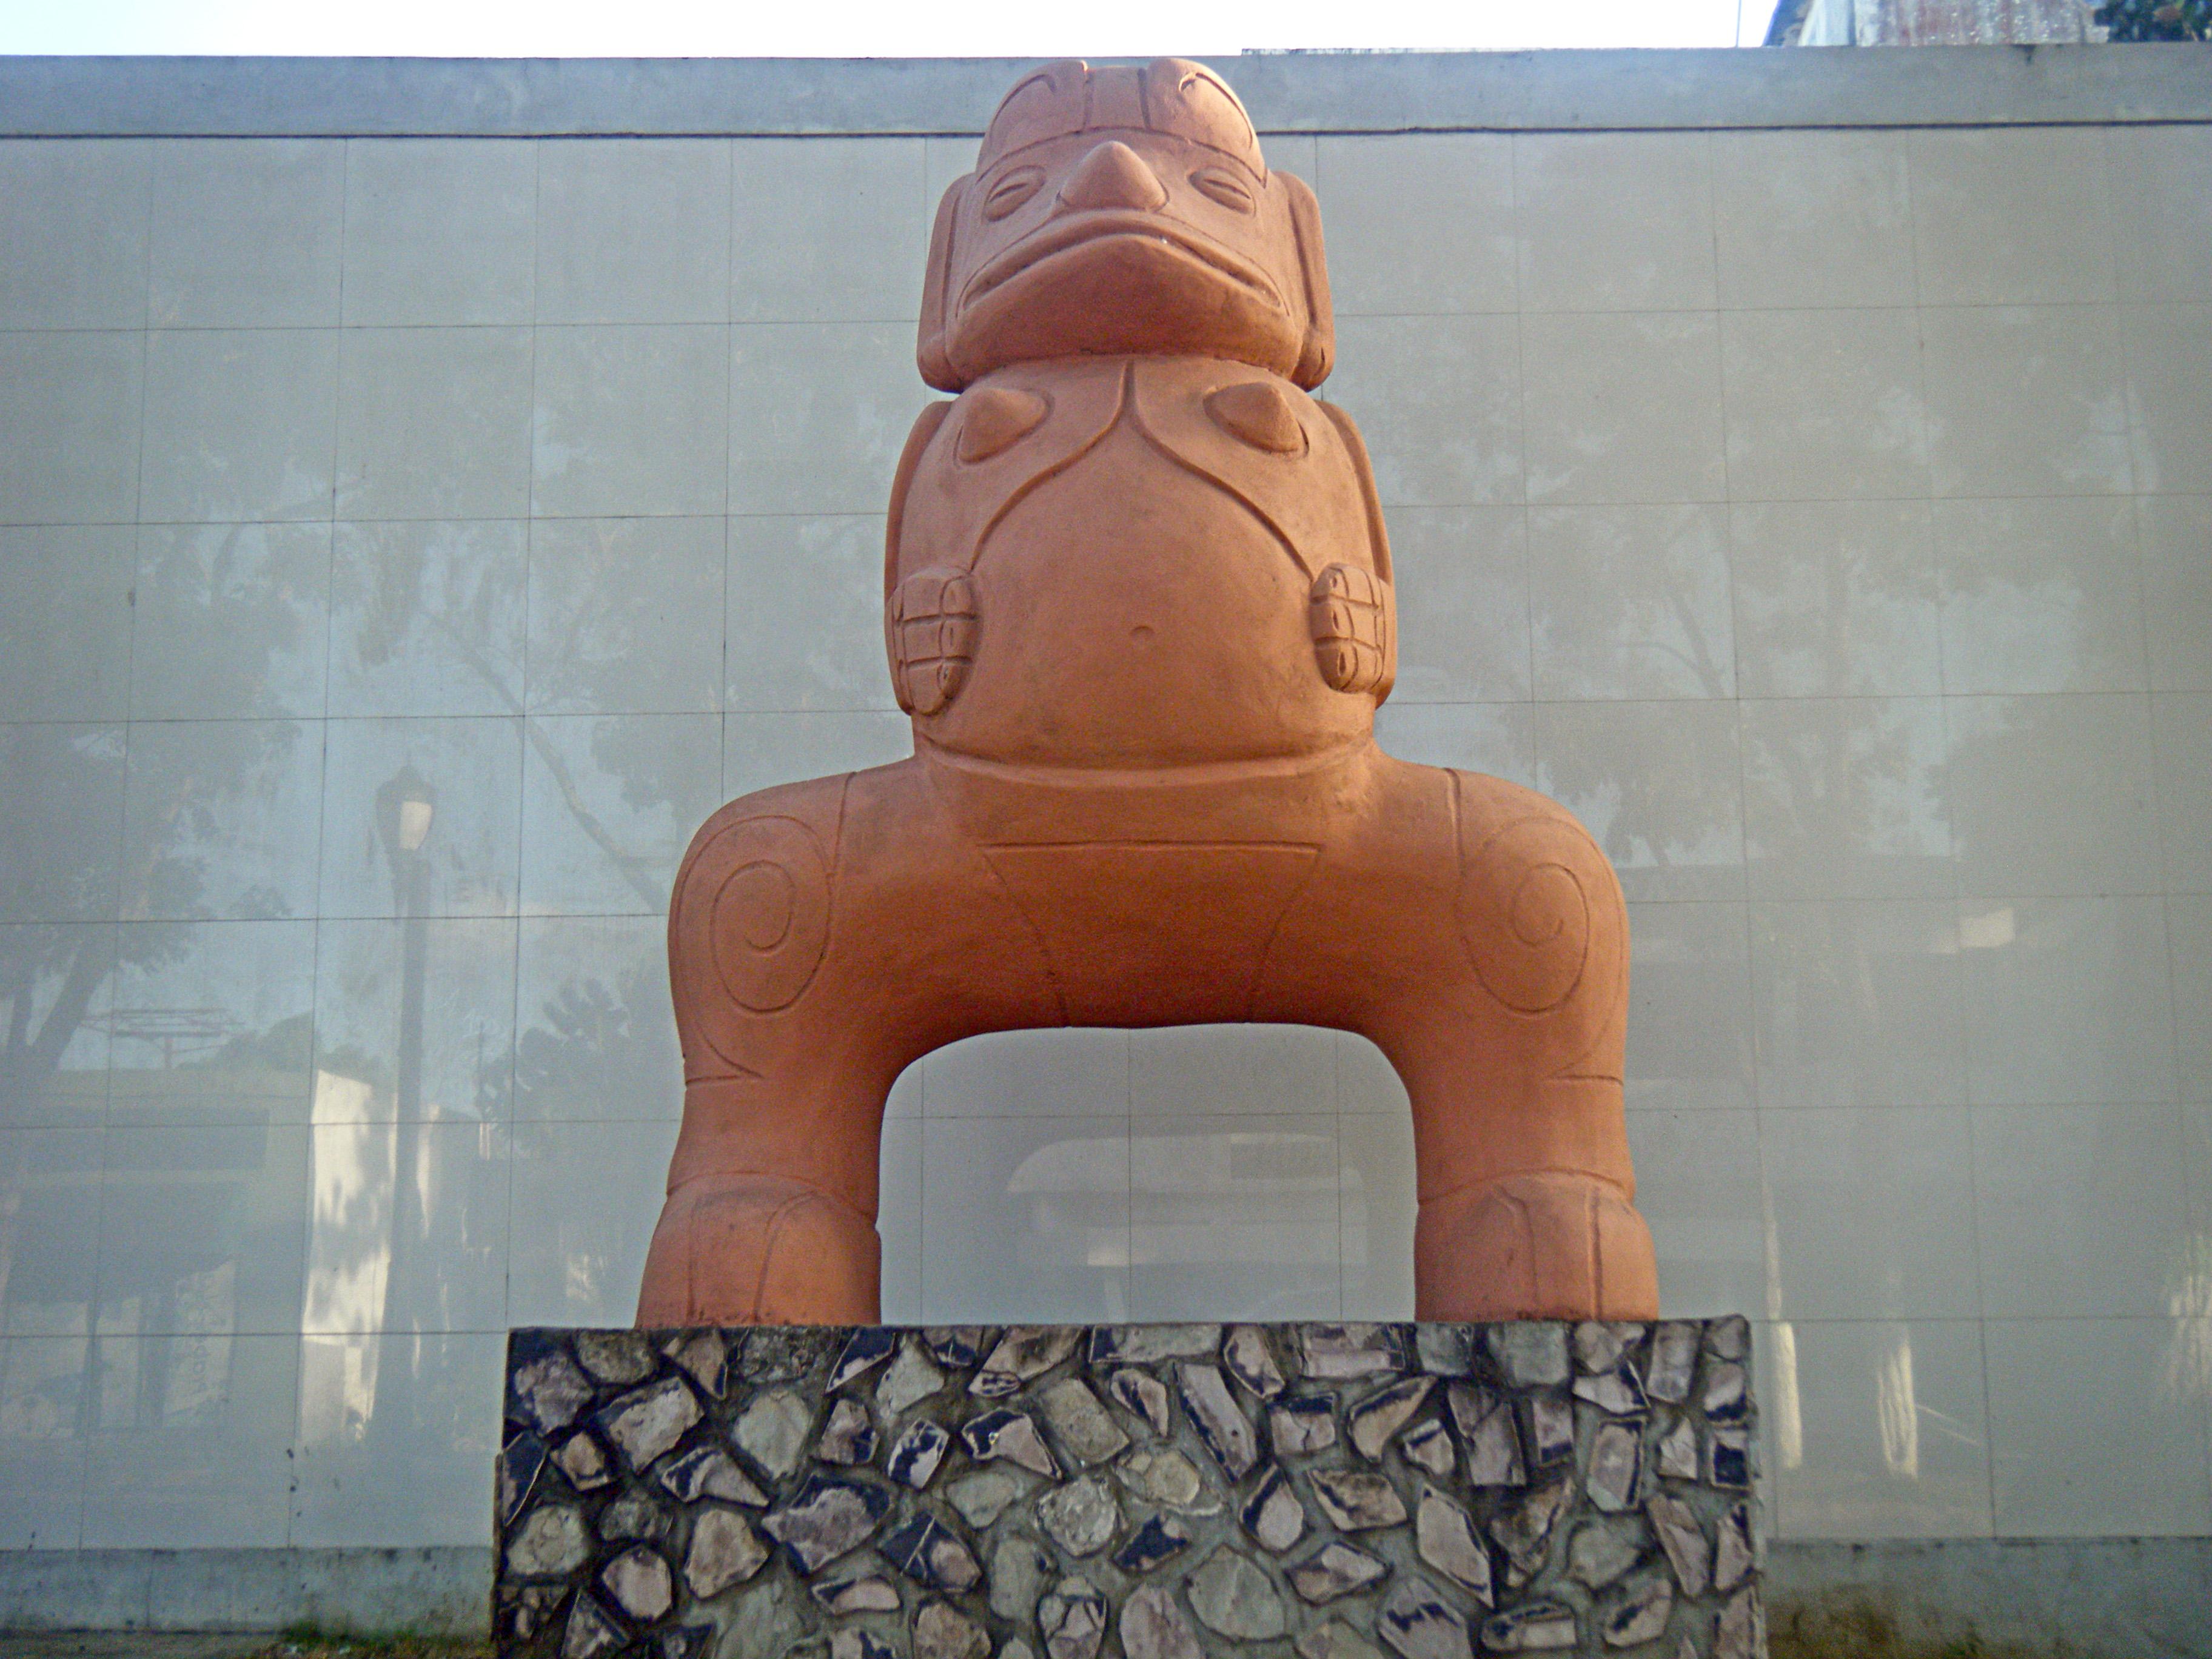 File Monumento De La Diosa De La Fertilidad En Maturin Jpg Wikimedia Commons